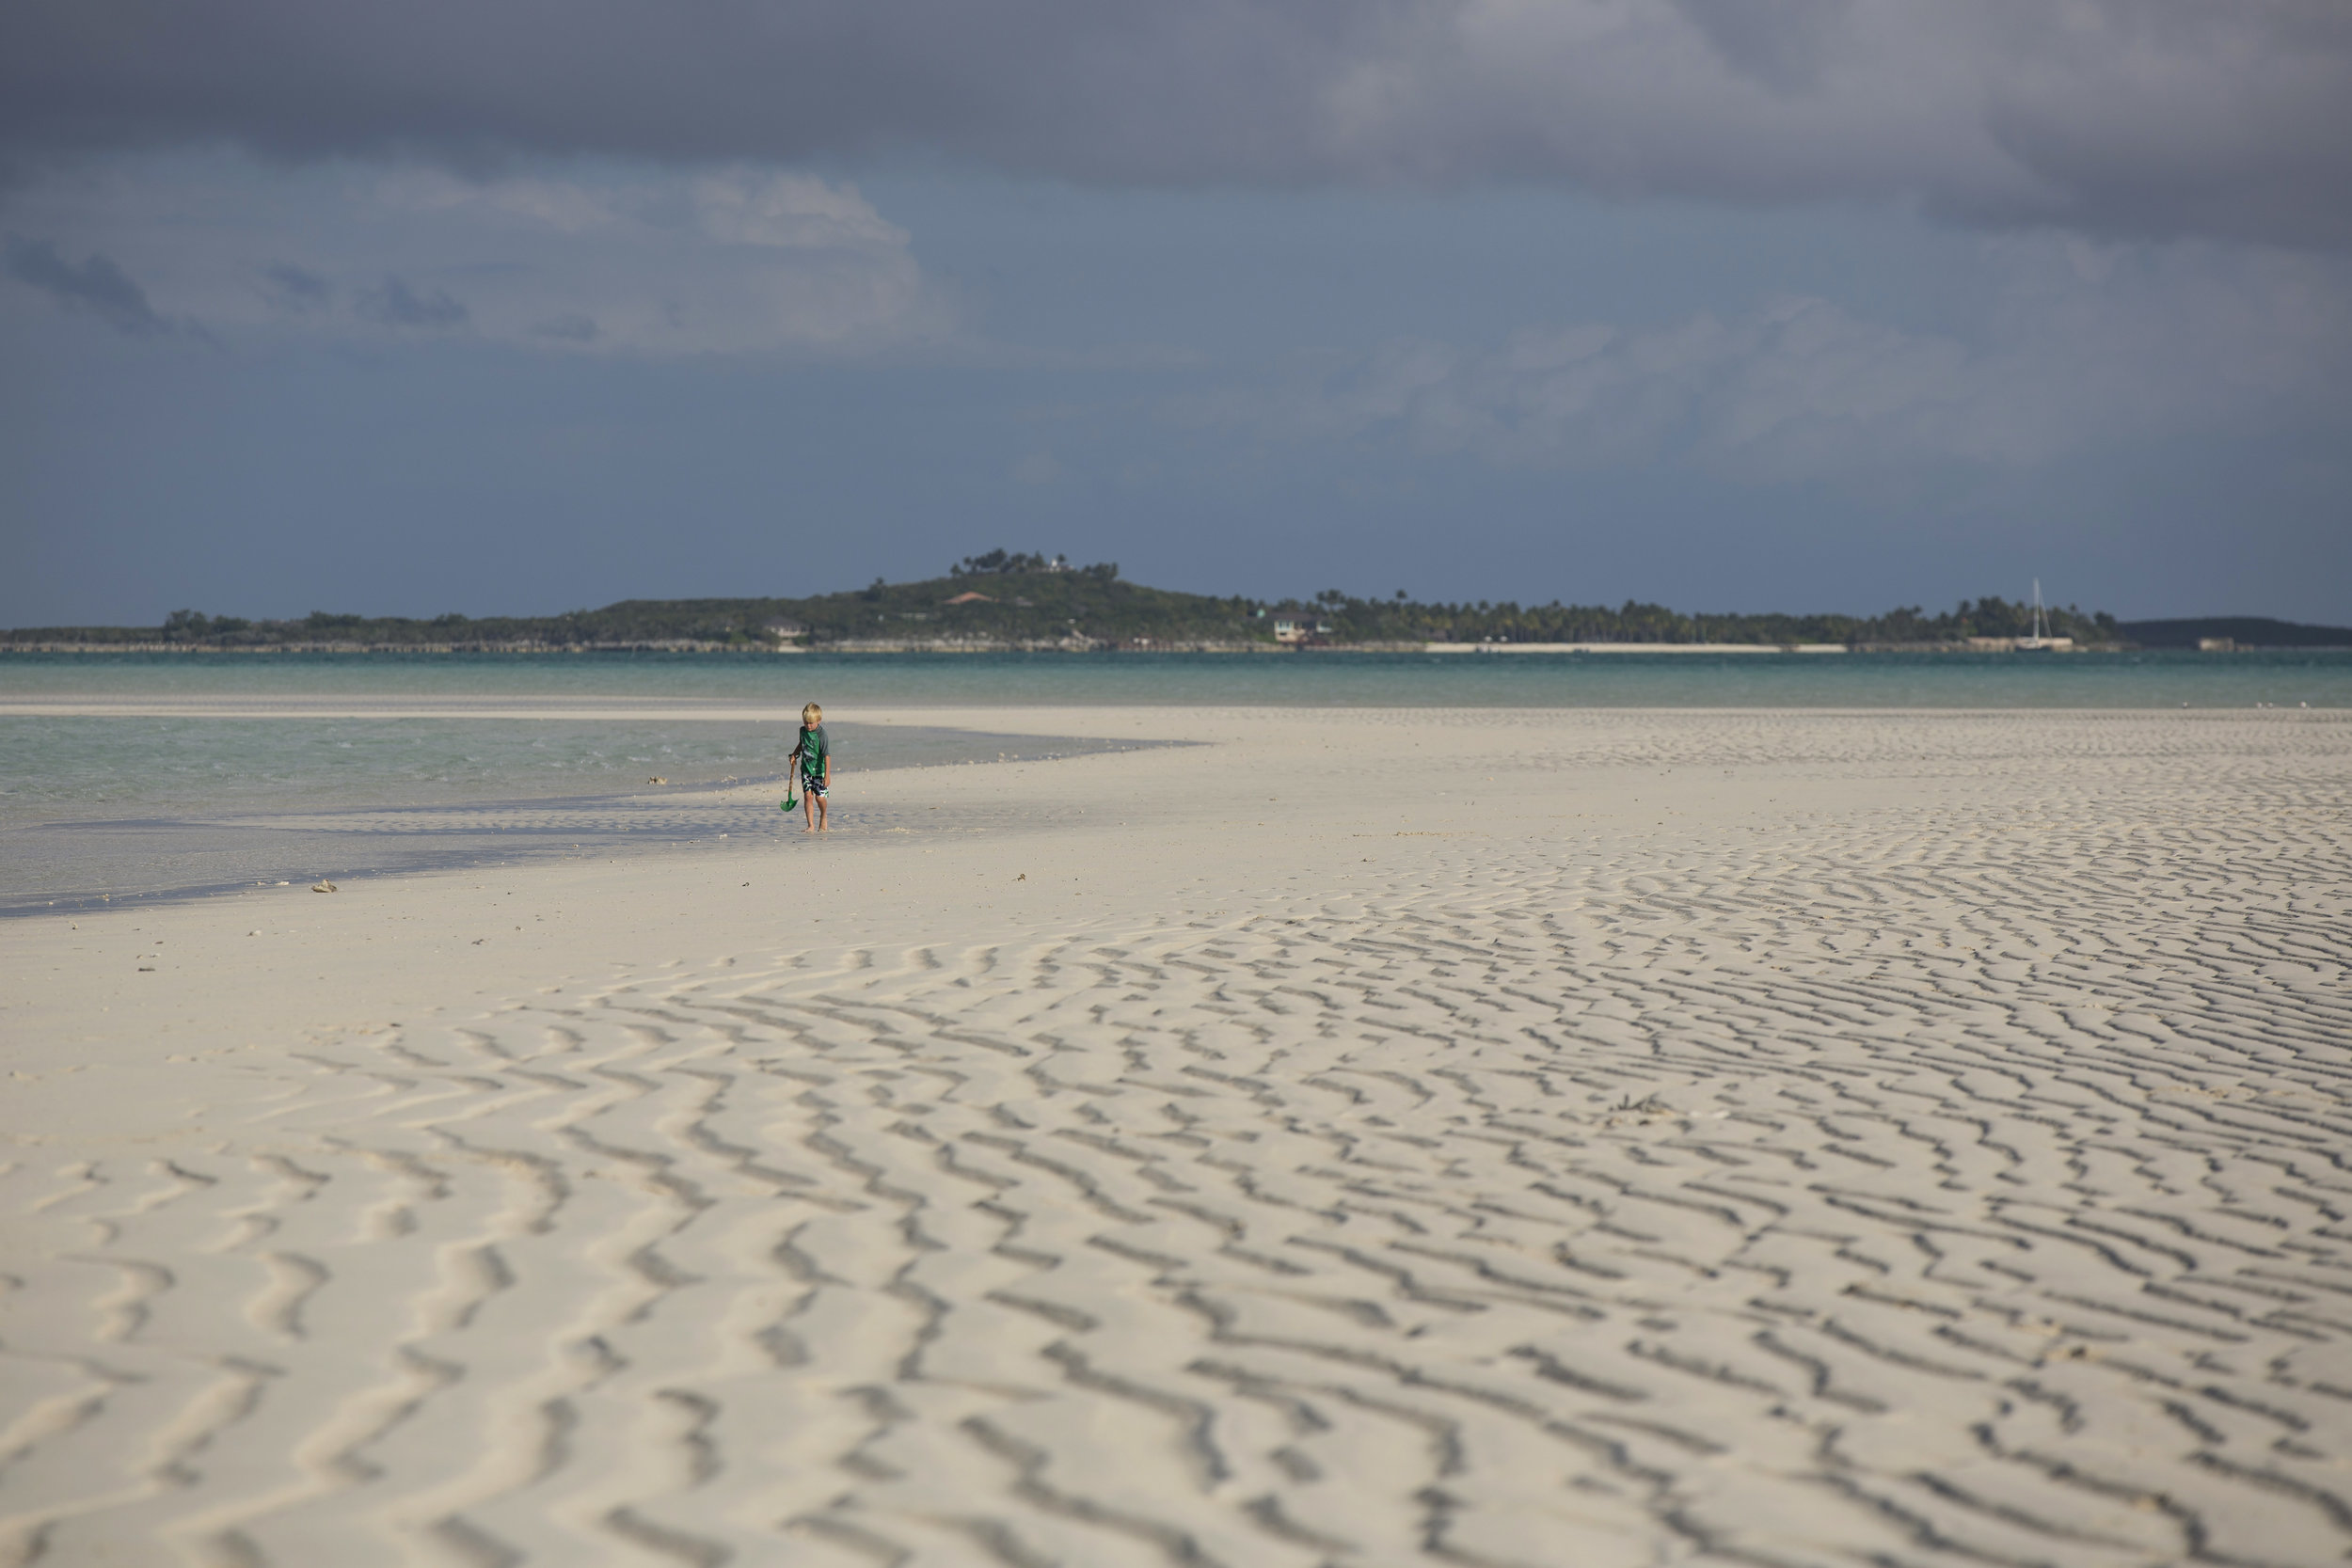 jason-decaires-taylor-Atlas-Yacht-sweet-escape-charter-dive-snorkle-activities-destinations-bahamas-luxury-eco-tourism-mdermaid-copperfield-rudder-cut-cay-exuma-sand-bank-sand-bar-bahamas